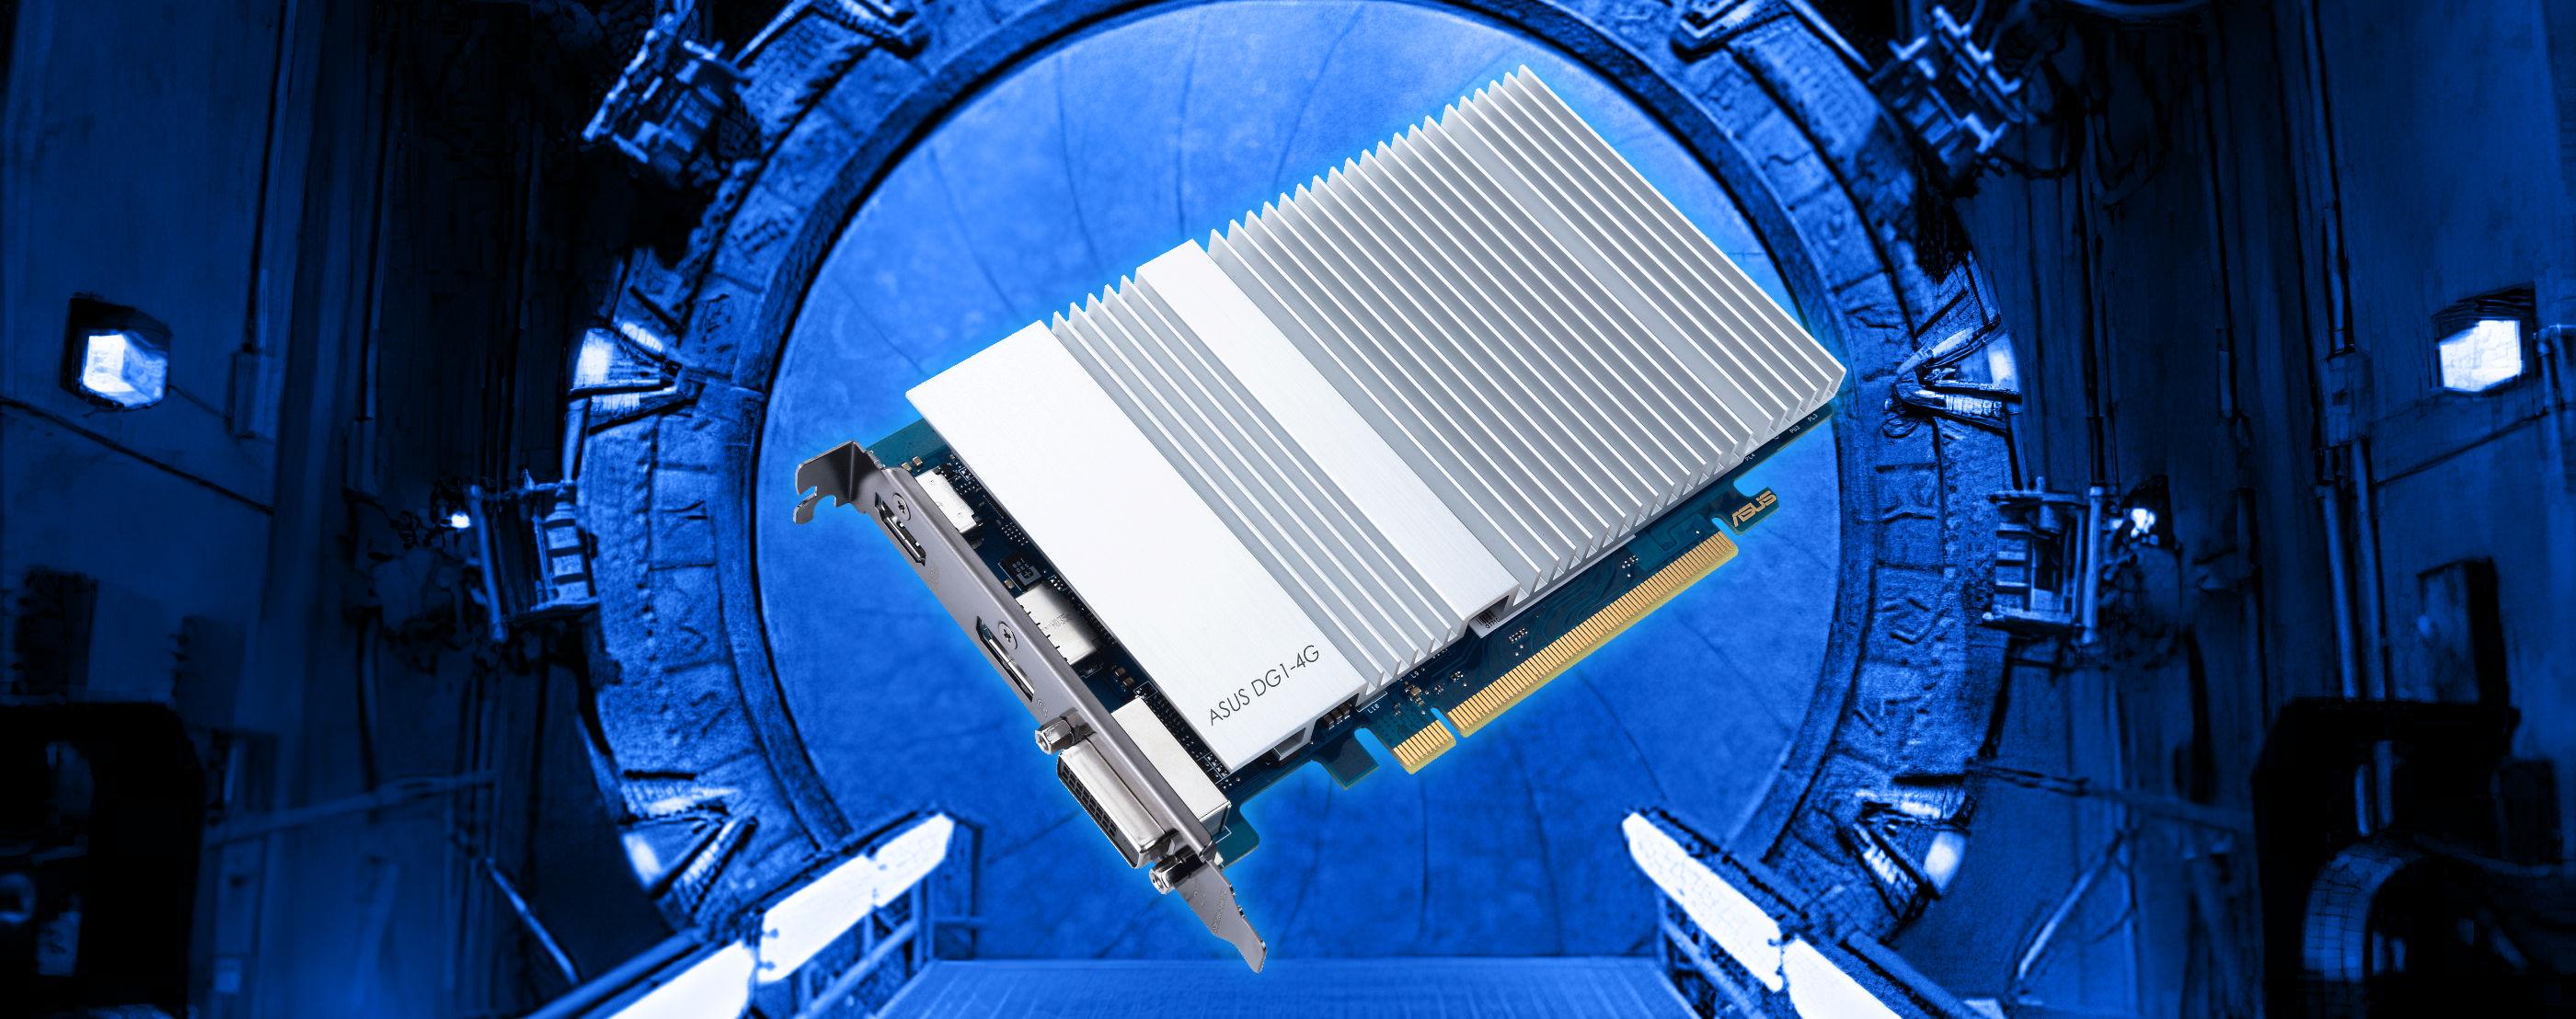 ASUS Iris Xe with Intel DG1 GPU tested, slower than Radeon RX 550 – VideoCardz.com